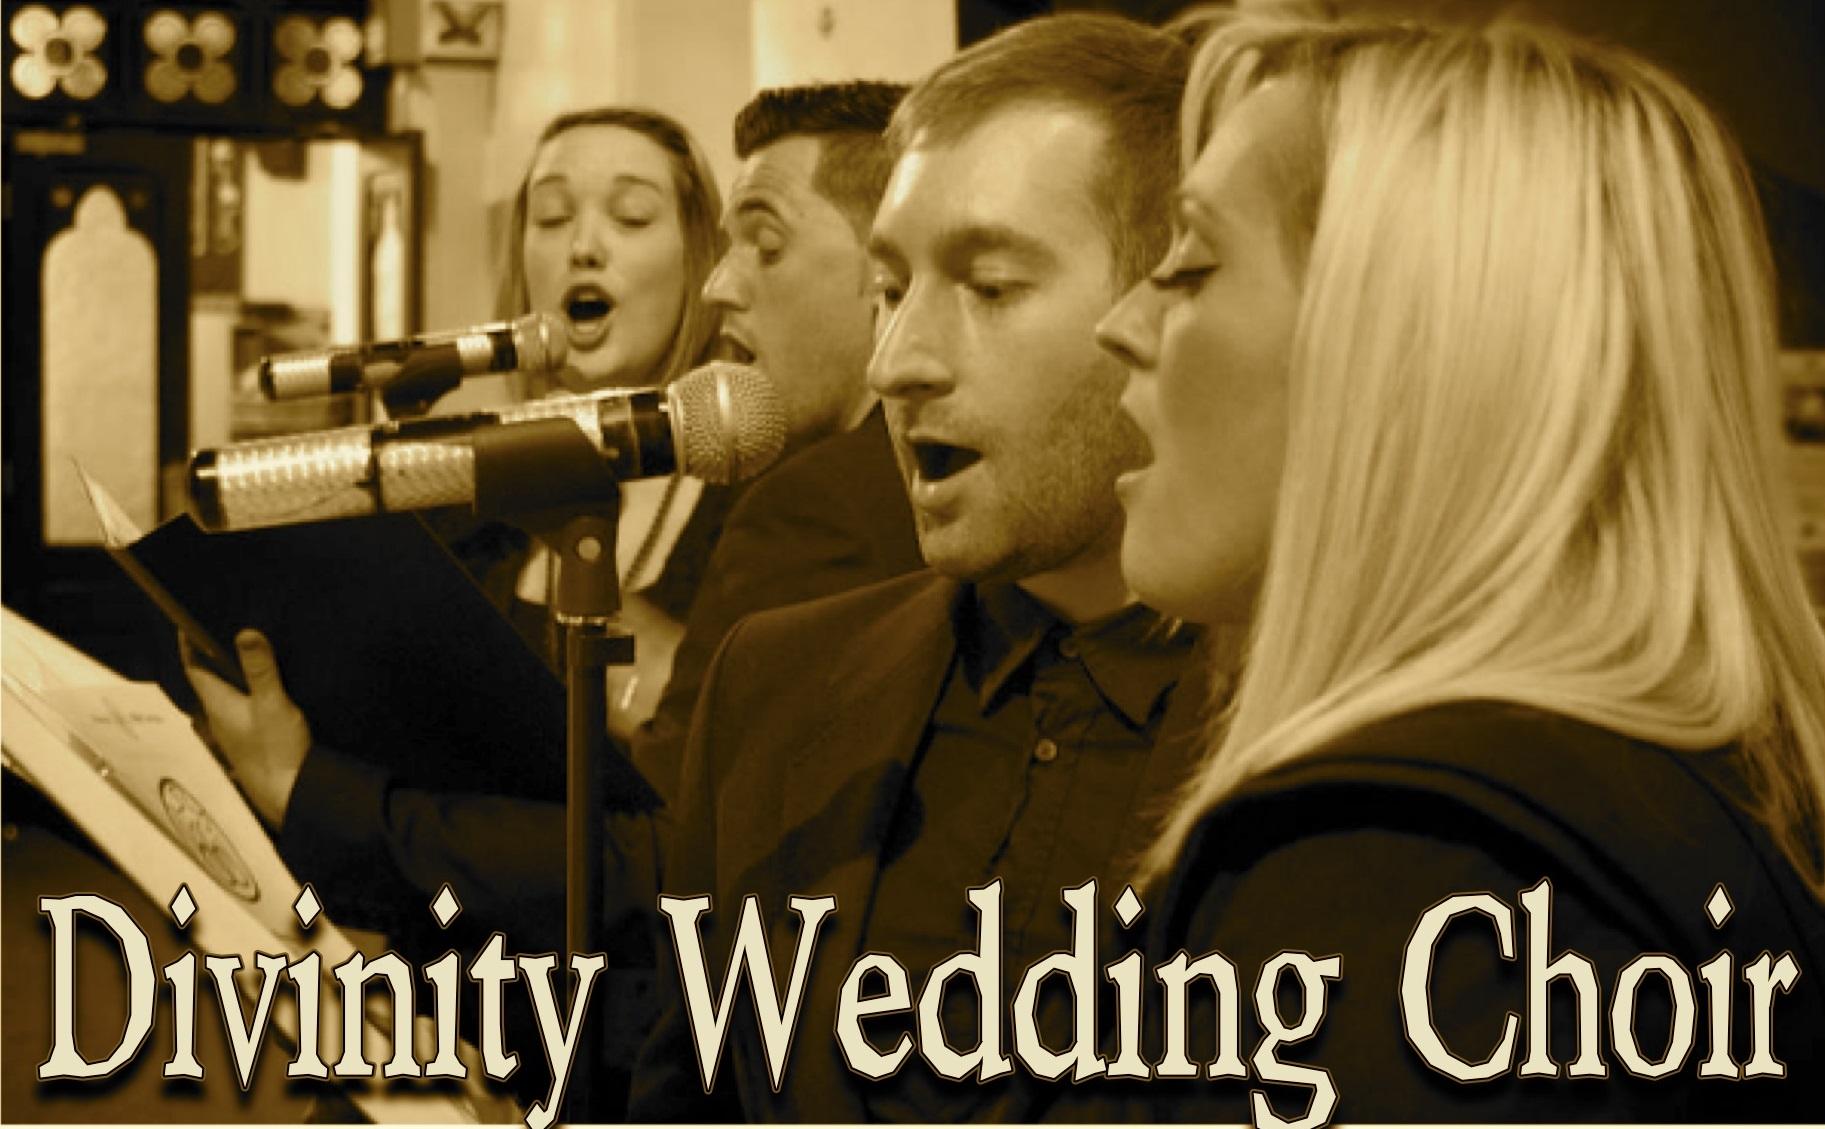 Divinity - Manchester Based Choir